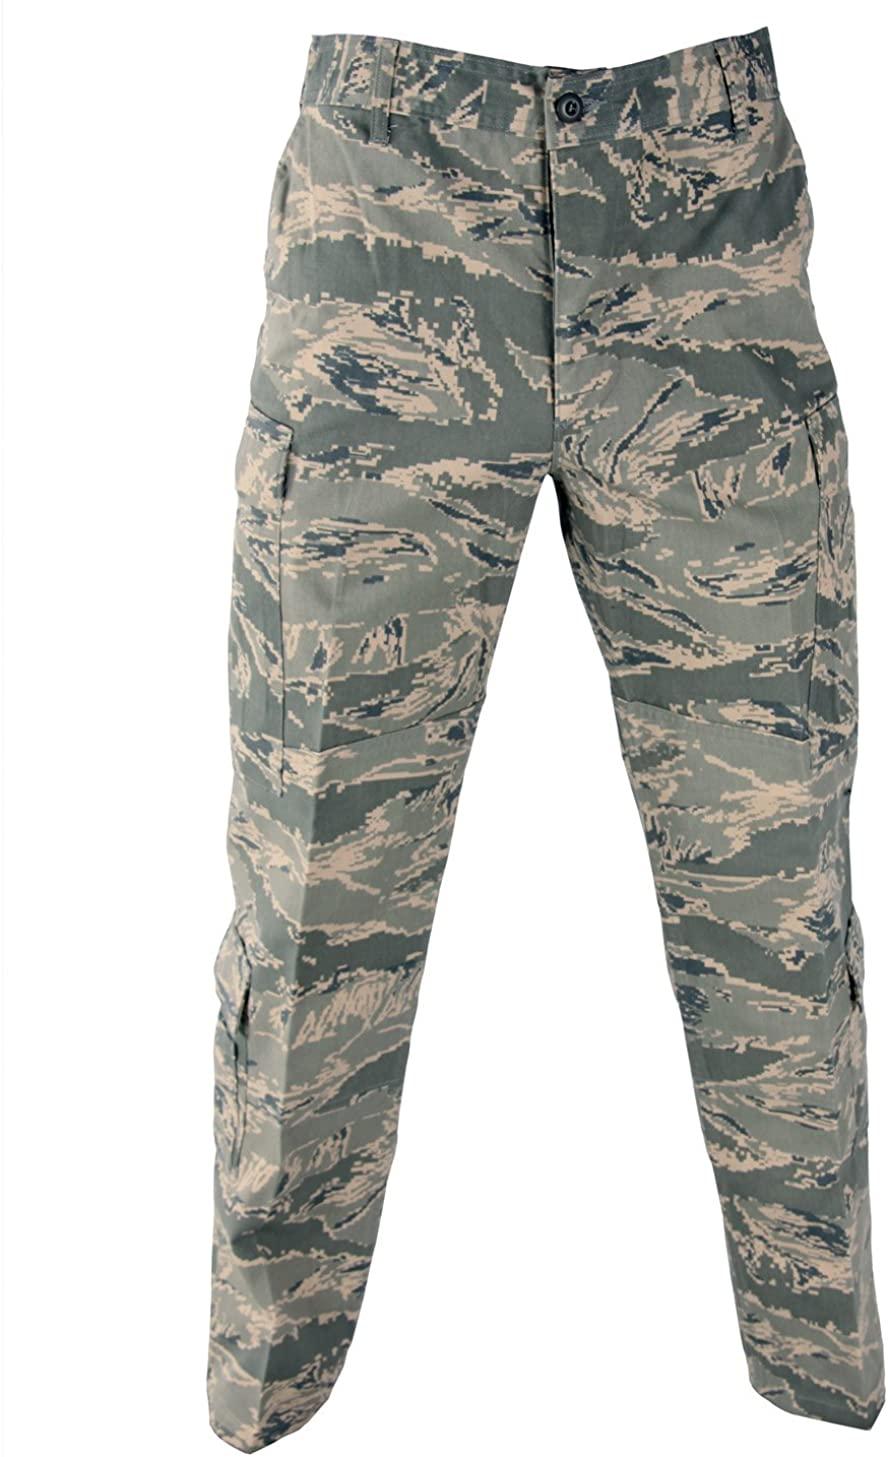 Propper Womens ABU Trouser 50/50 Nylon/Cotton Ripstop, AF Tiger Stripe Digital, Size 10